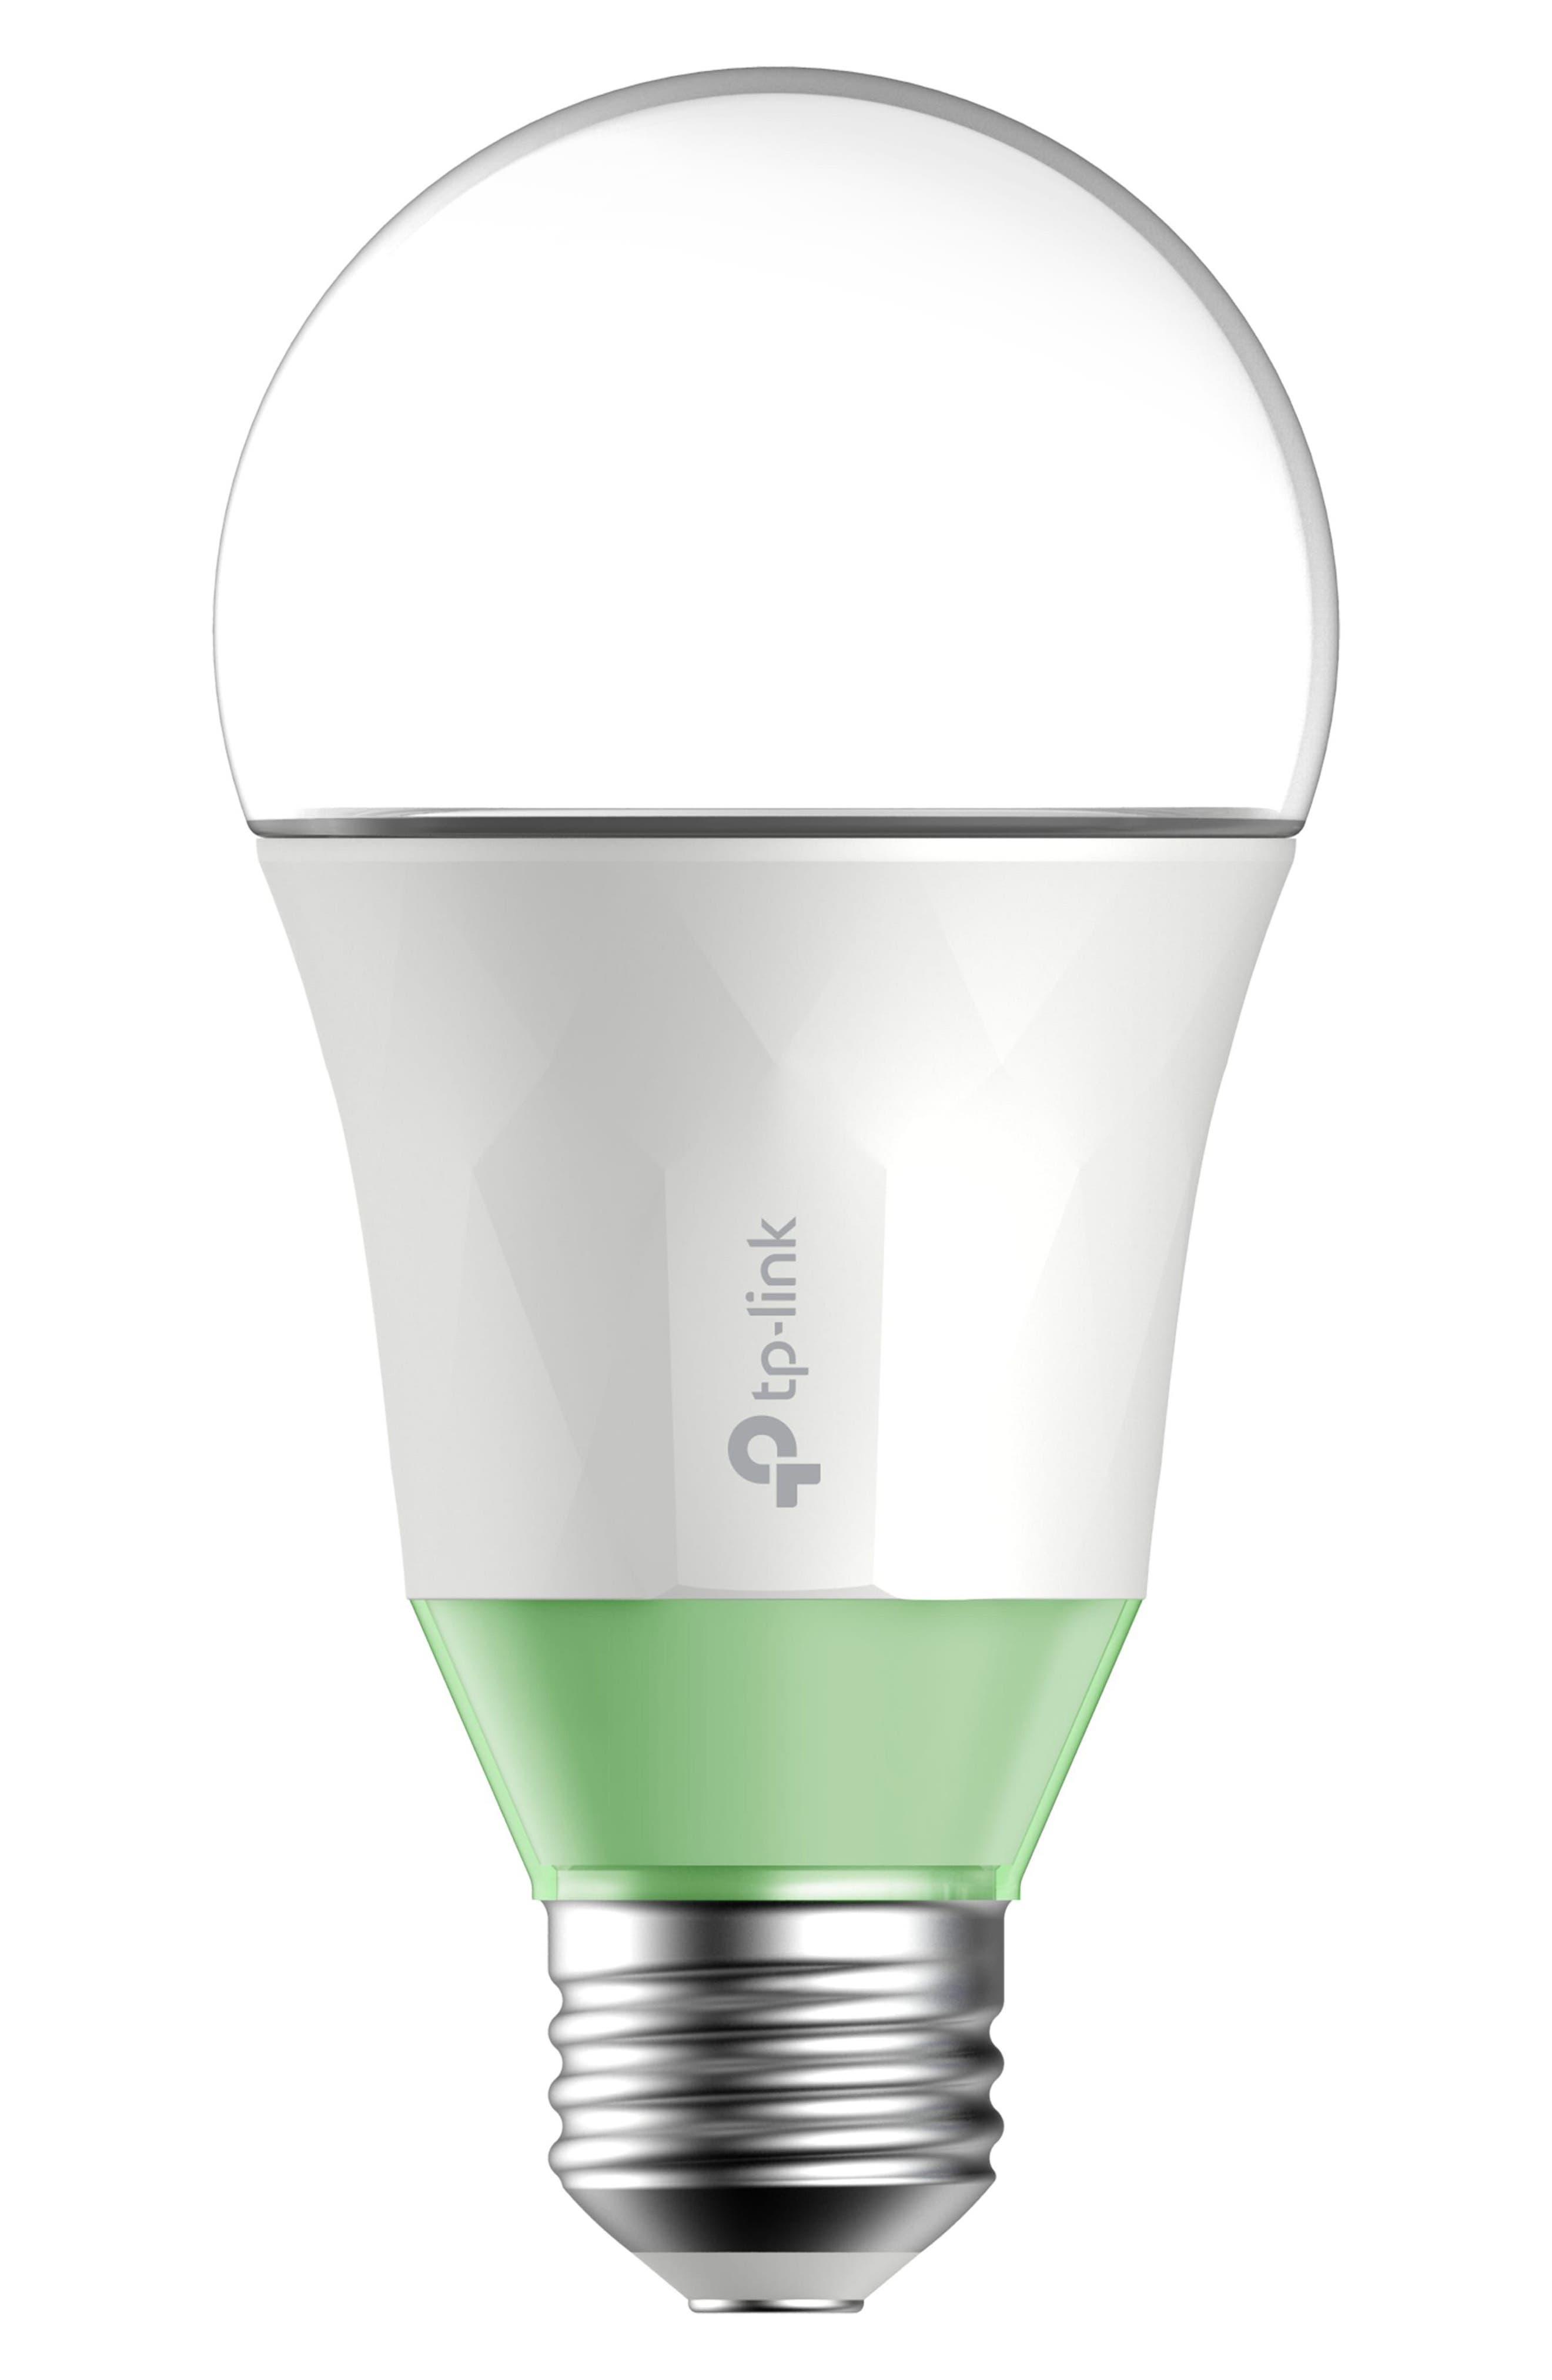 TP-Link Smart Wi-Fi Dimmable LED Light Bulb